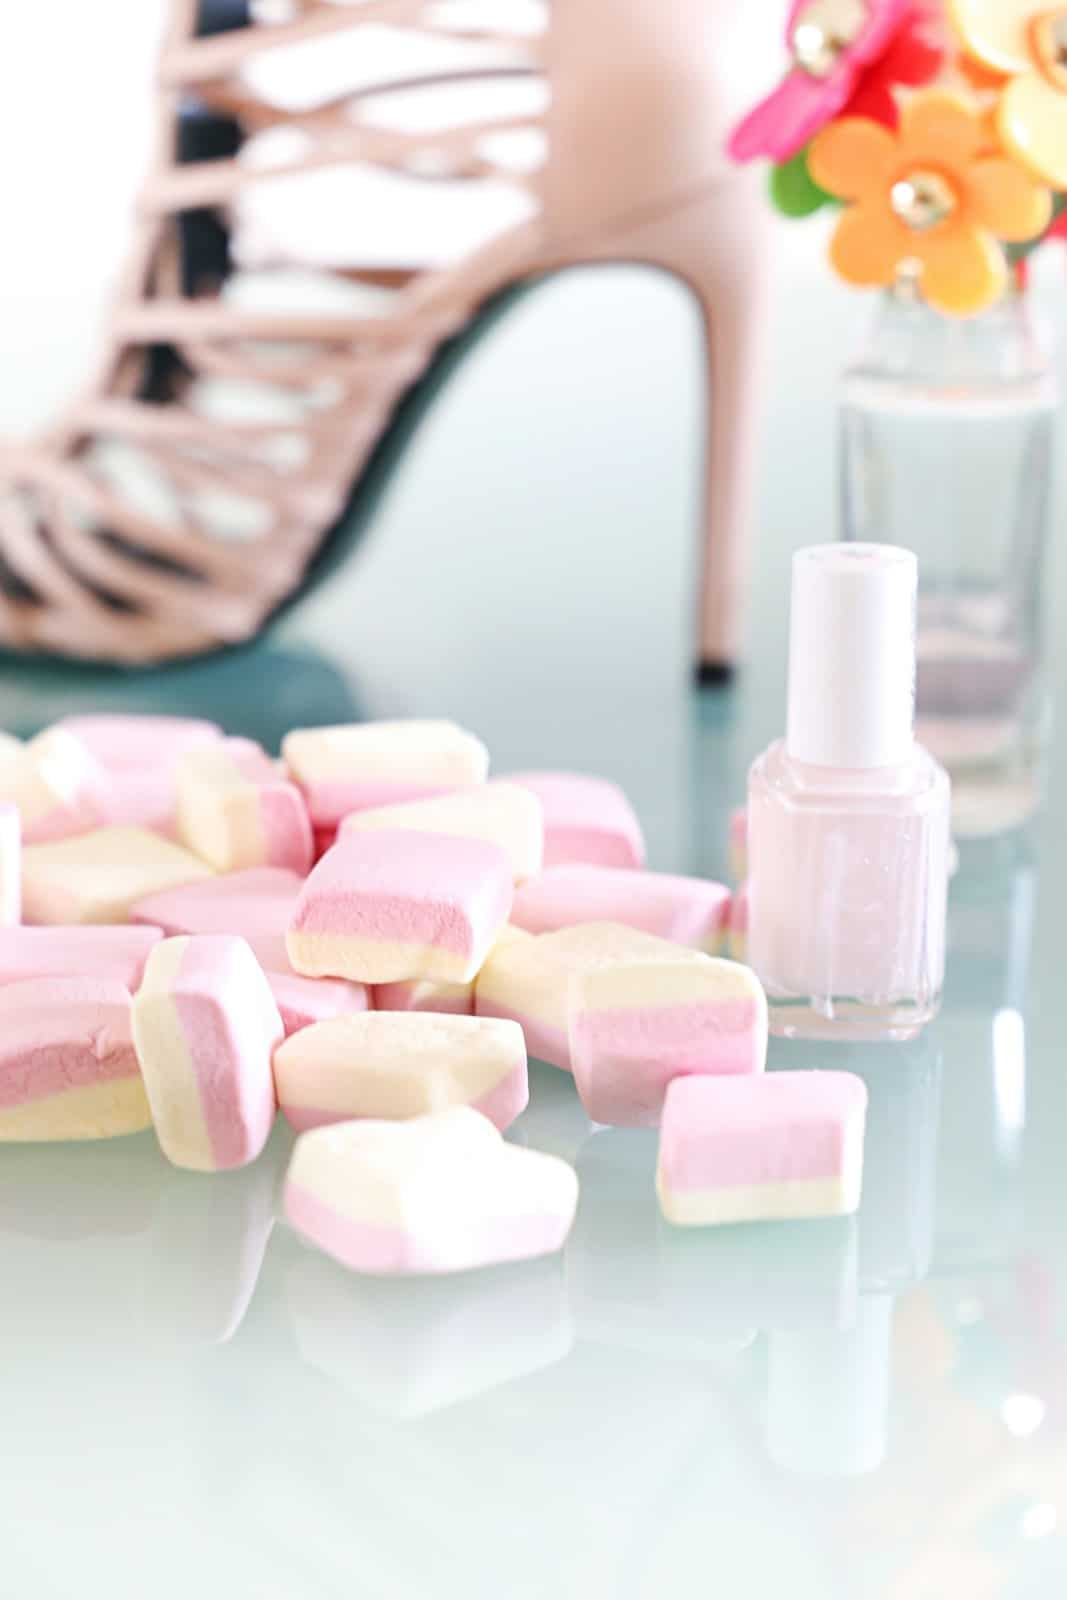 Desbelleschoses sweets and candy hitschler die farben des jahres 3.jpg